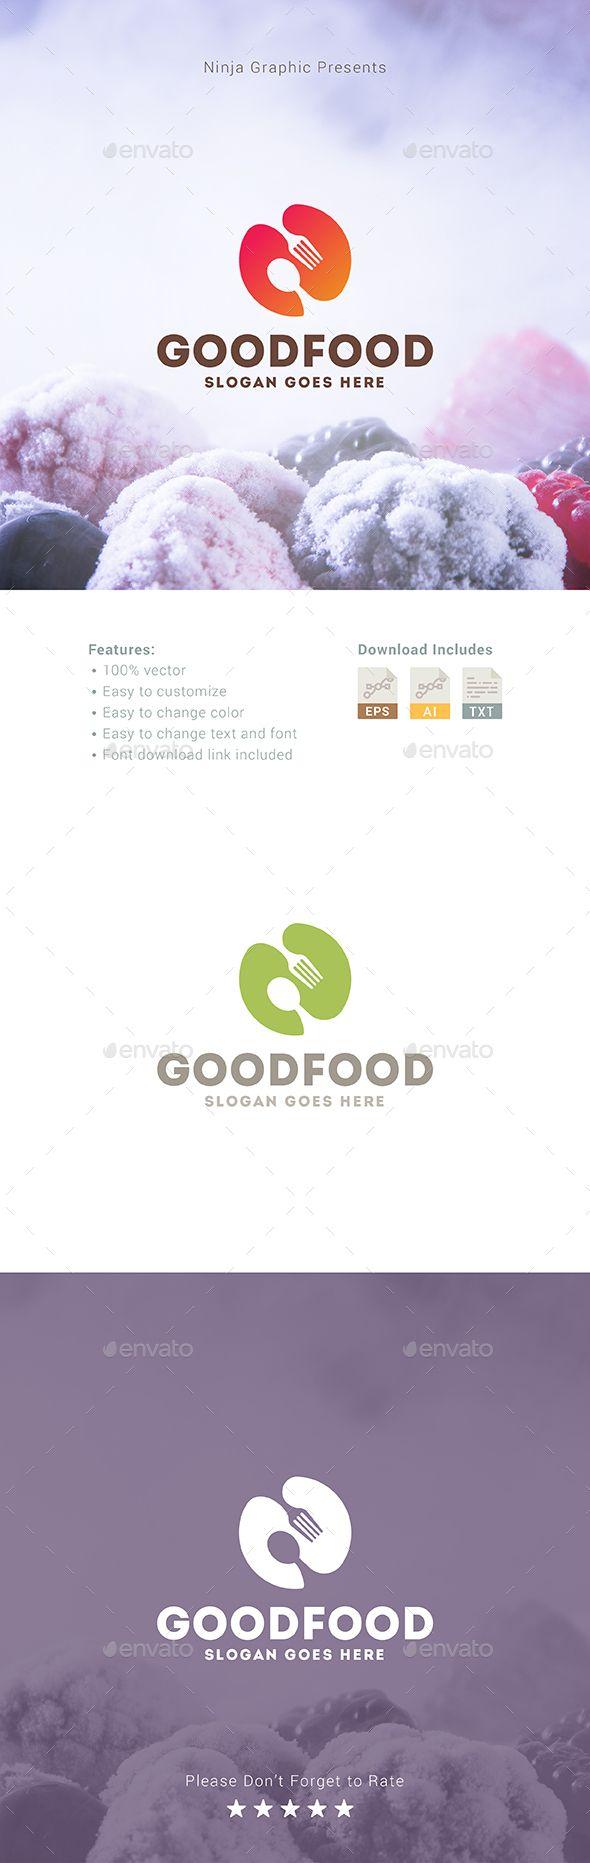 Good Food Logo Template Vector EPS, AI Illustrator #logotype Download here: https://graphicriver.net/item/good-food-logo/16970663?ref=ksioks